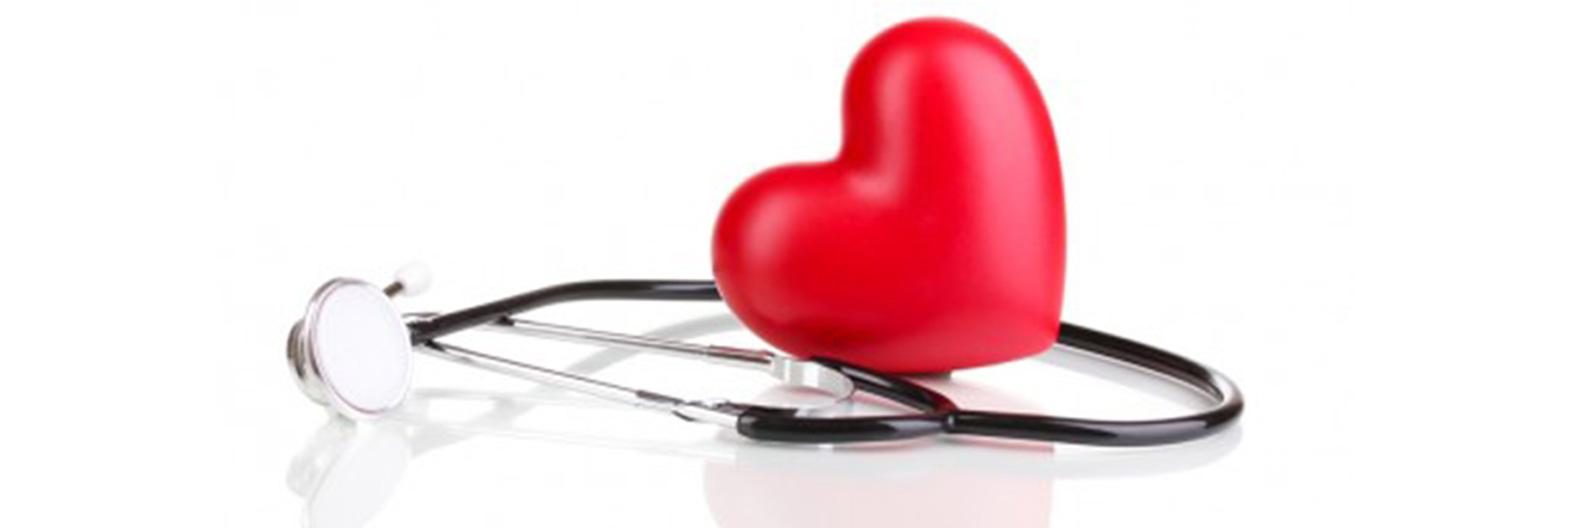 jei hipertenzija negydoma